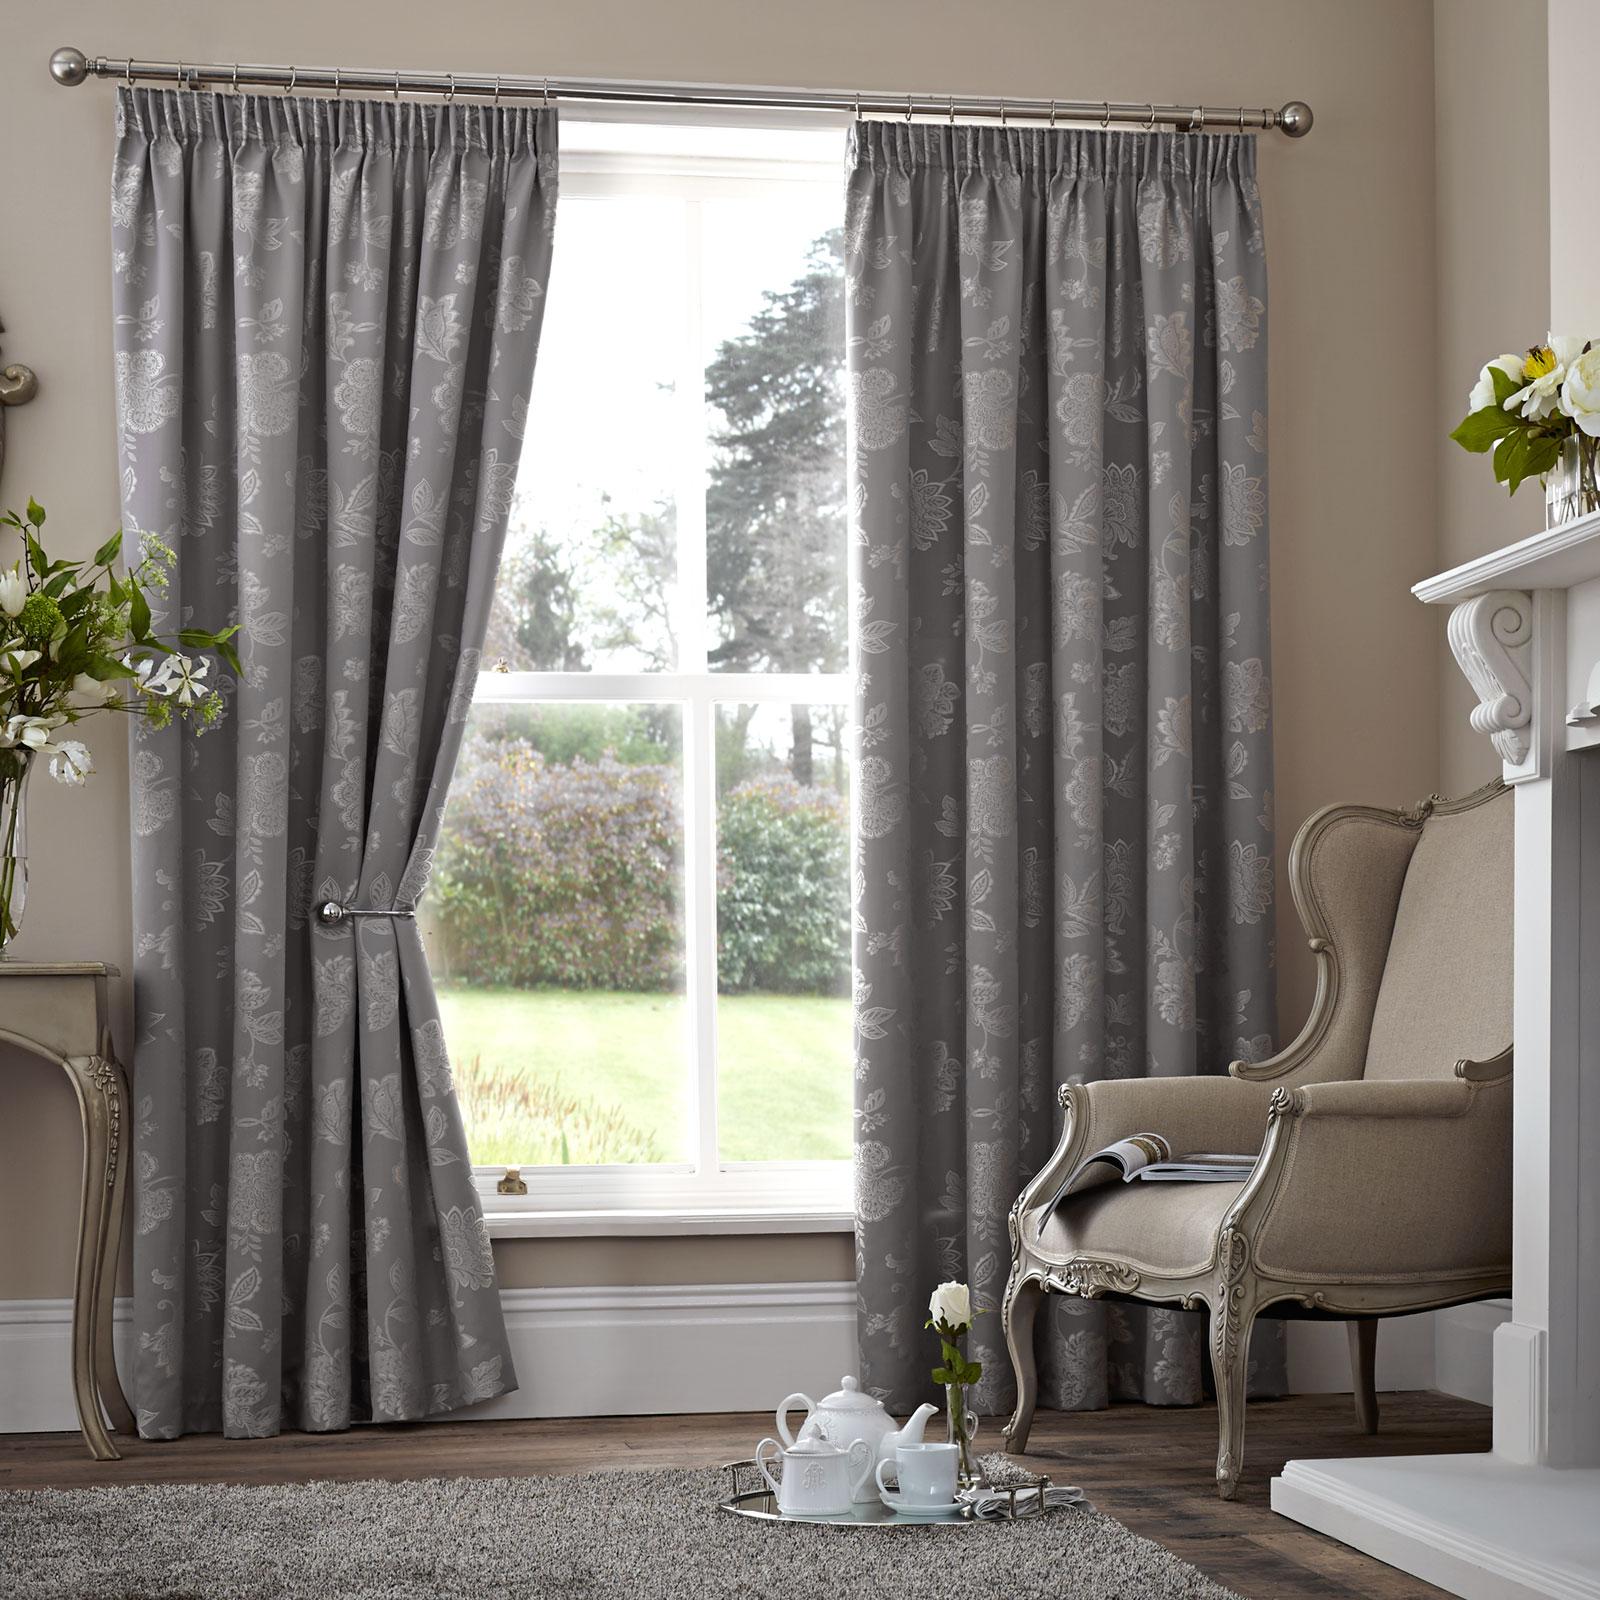 Floral Jacquard Thermal Curtains Pair